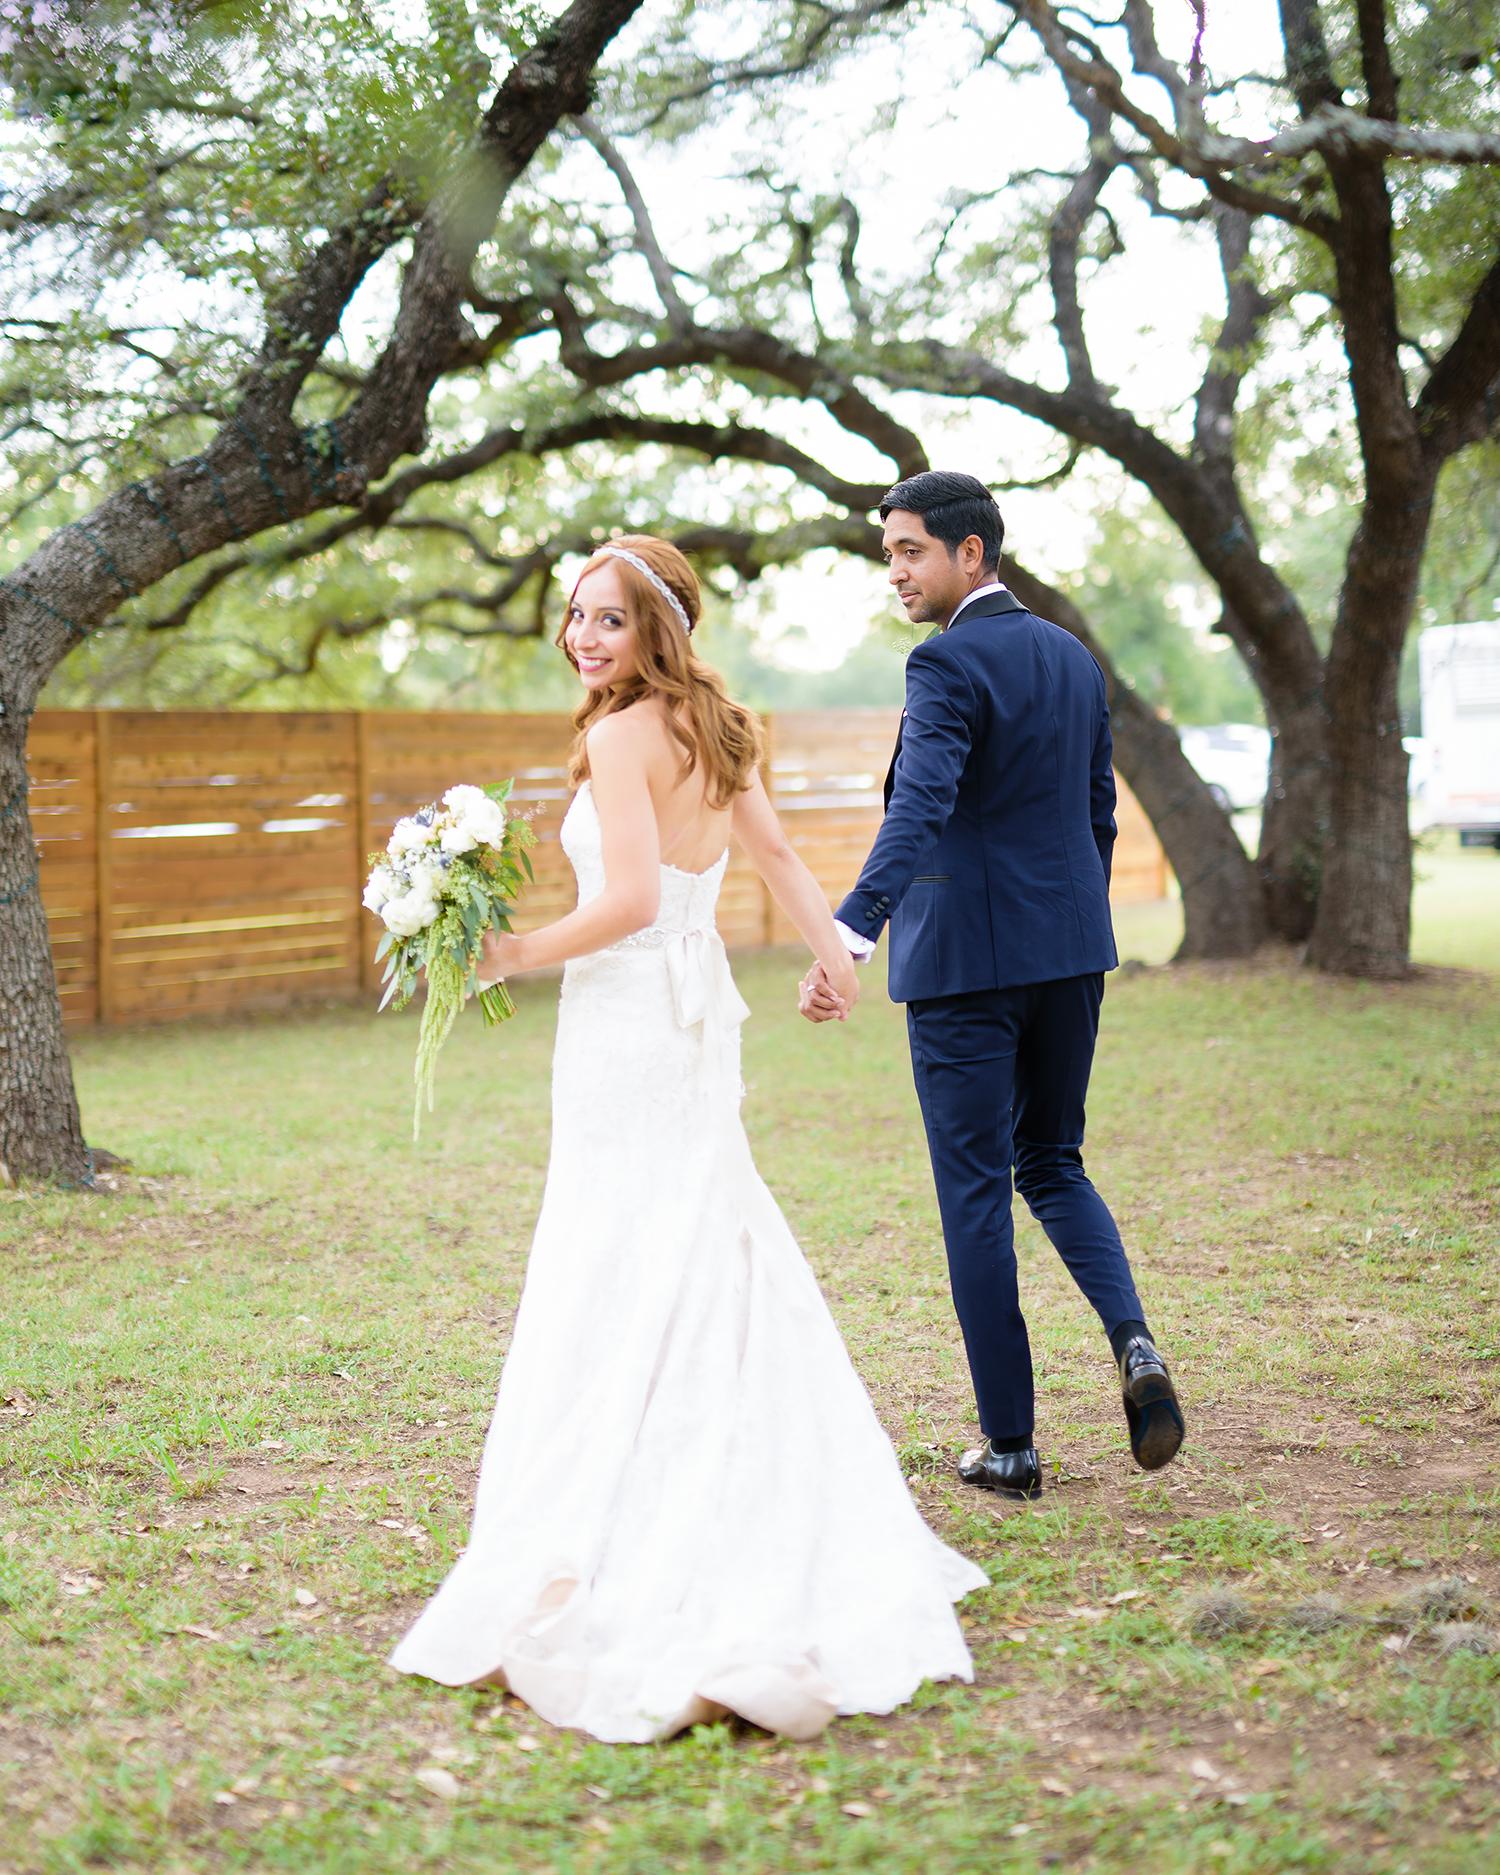 161001-Melina-&-Jose-Wedding-711-Web.jpg